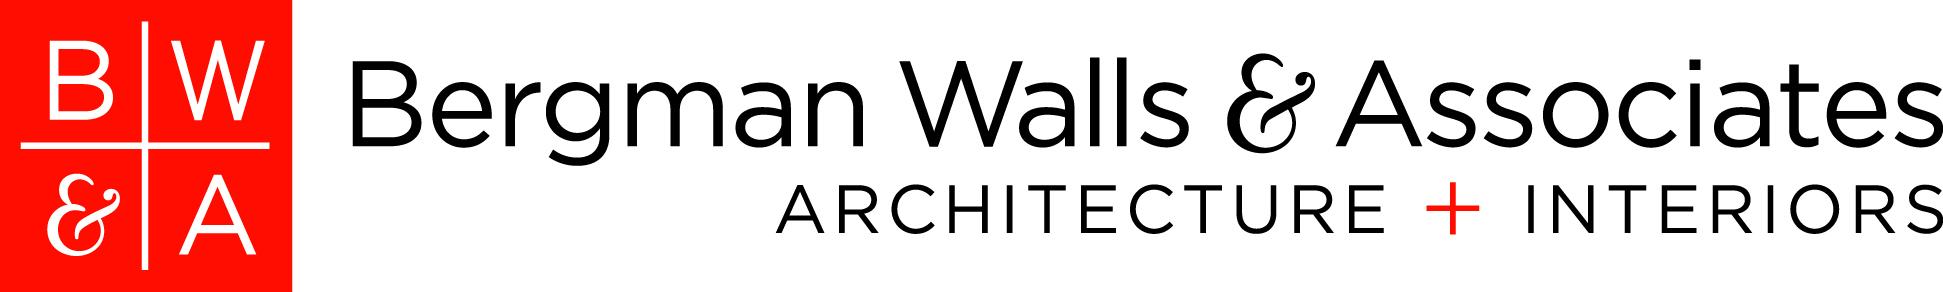 BERGMAN WALLS & ASSOCIATES VIETNAM LLC